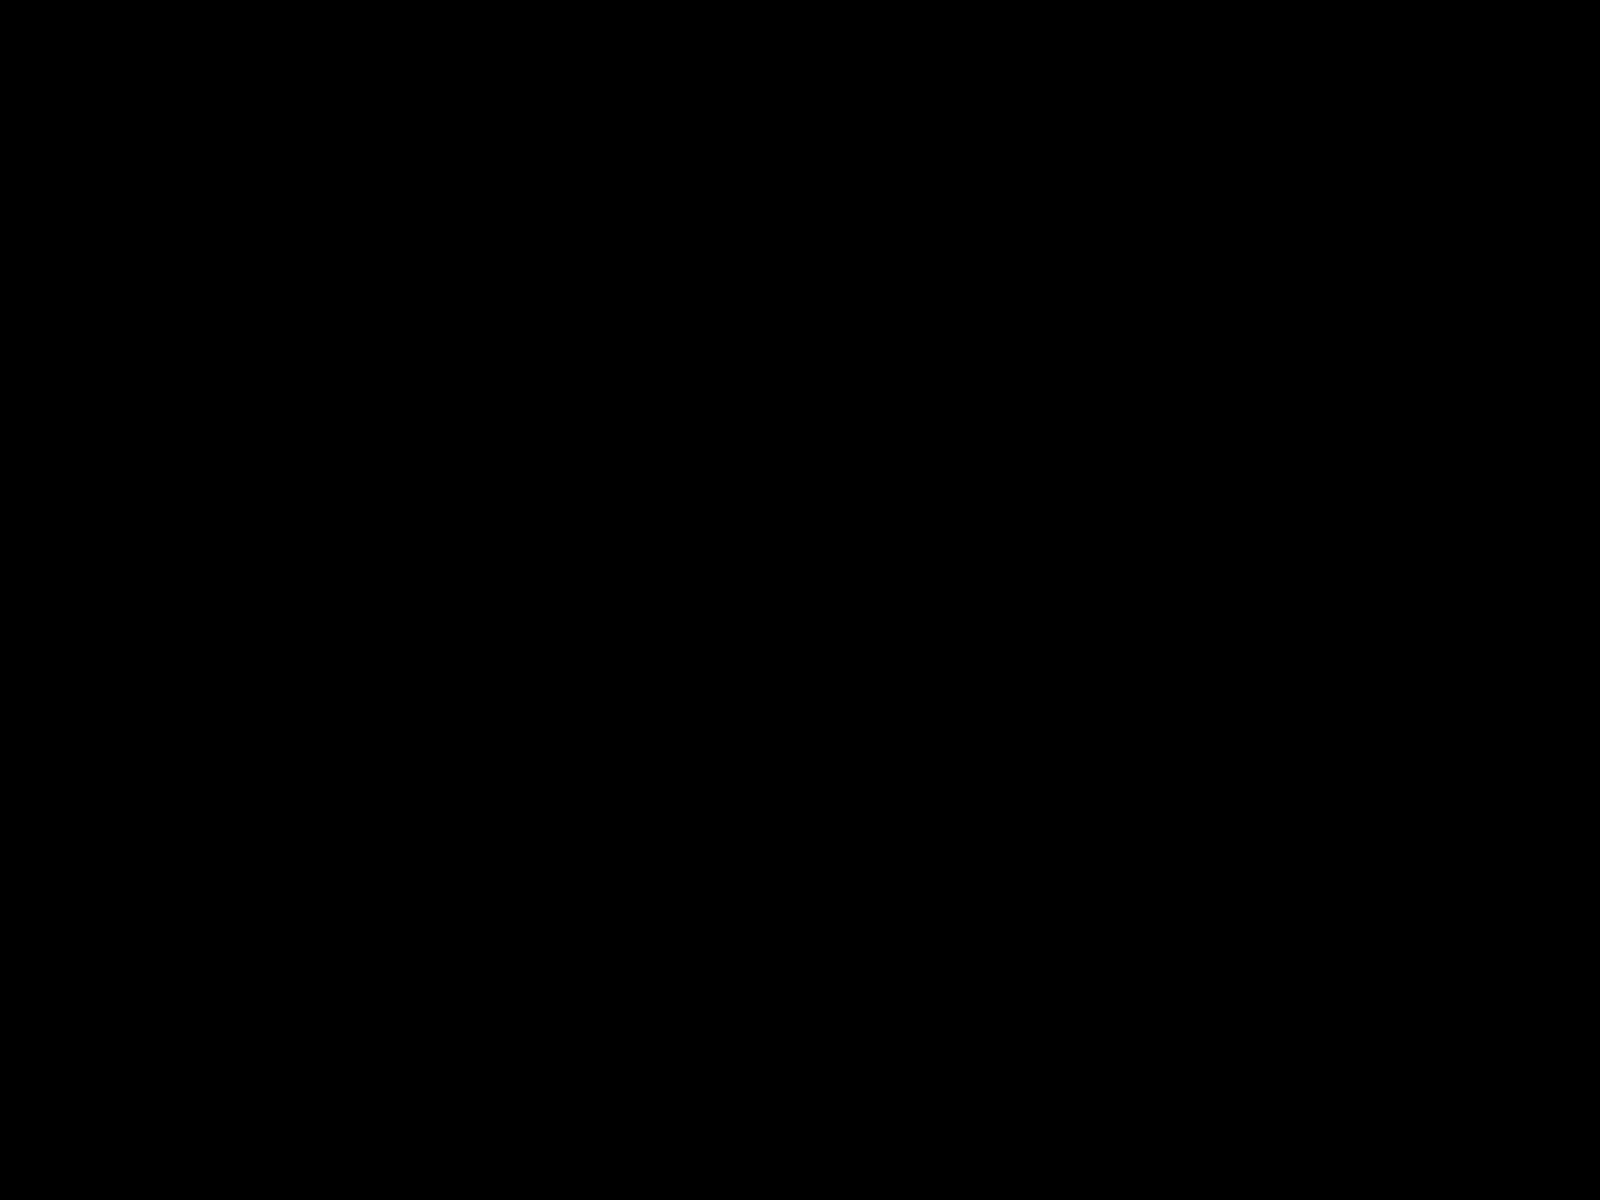 Blackbird2 logo.png